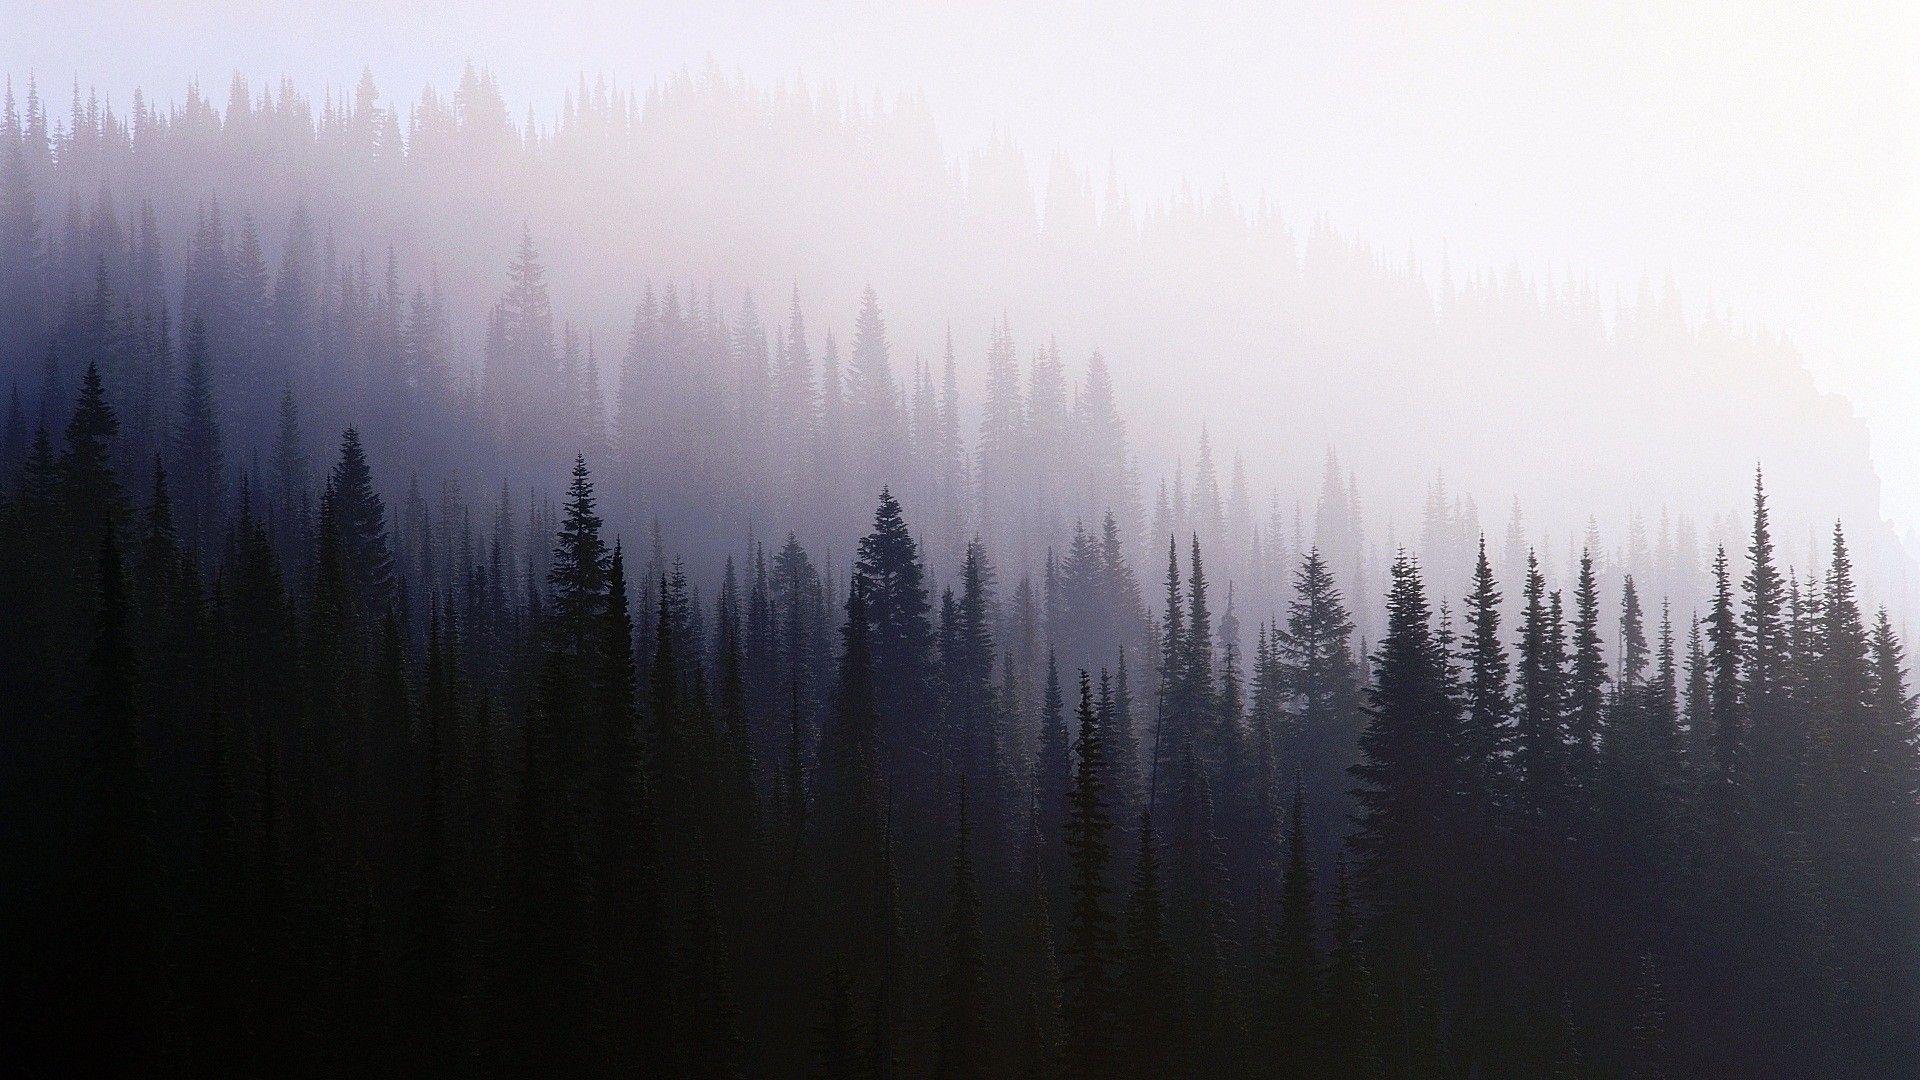 Nature Trees Mist Forest Wallpaper En 2019 Fondos